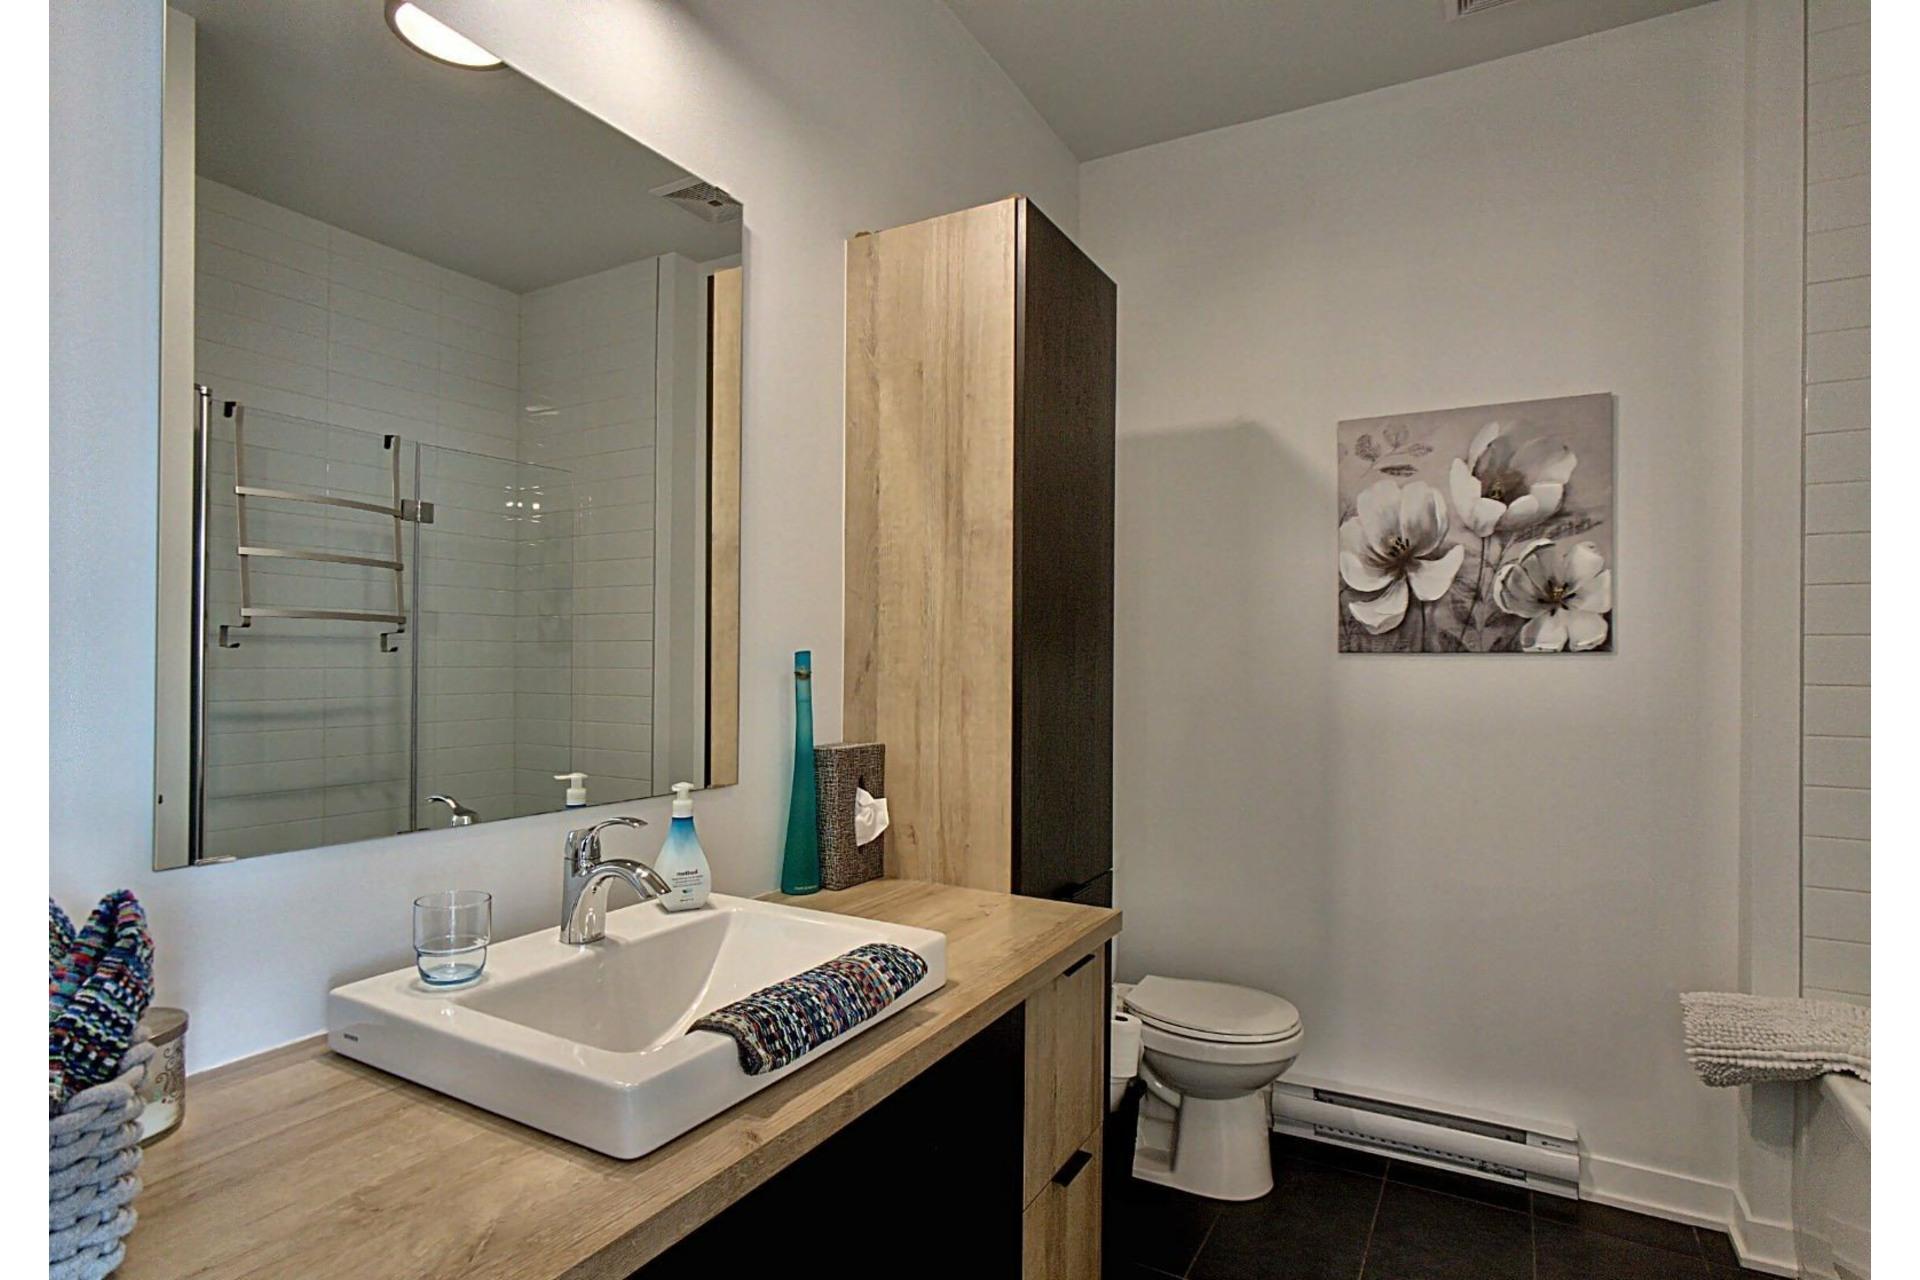 image 5 - Apartment For sale Saint-Lambert - 6 rooms